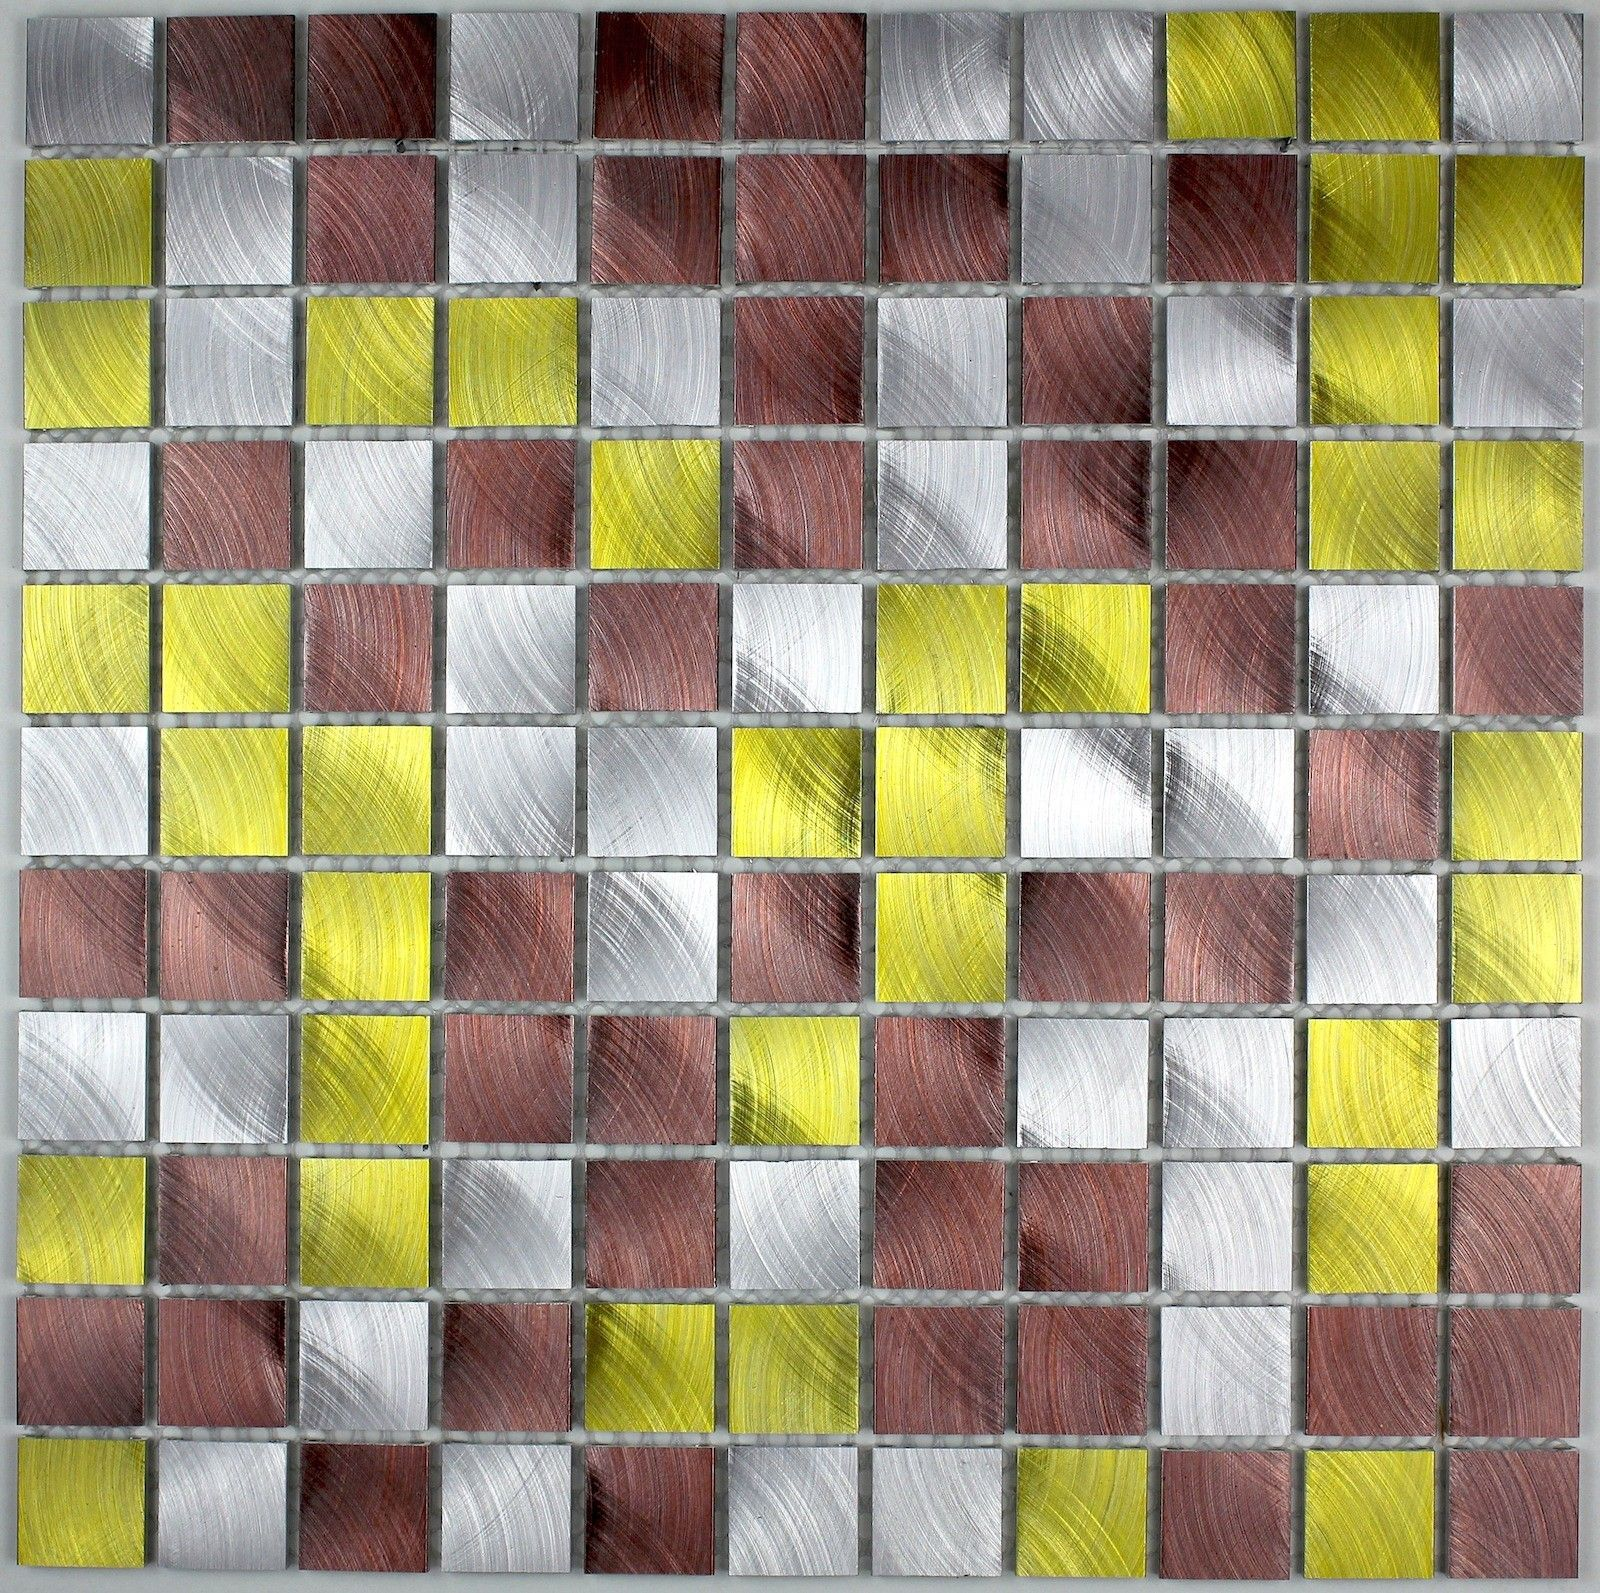 Aluminium Mosaic Tiles Kitchen Ma Alu25 Dor16 90 Length 11 61 In Width 29 5 Cm Thickness 5 Mm Material Alumini Carrelage Mural Carrelage Carrelage Inox